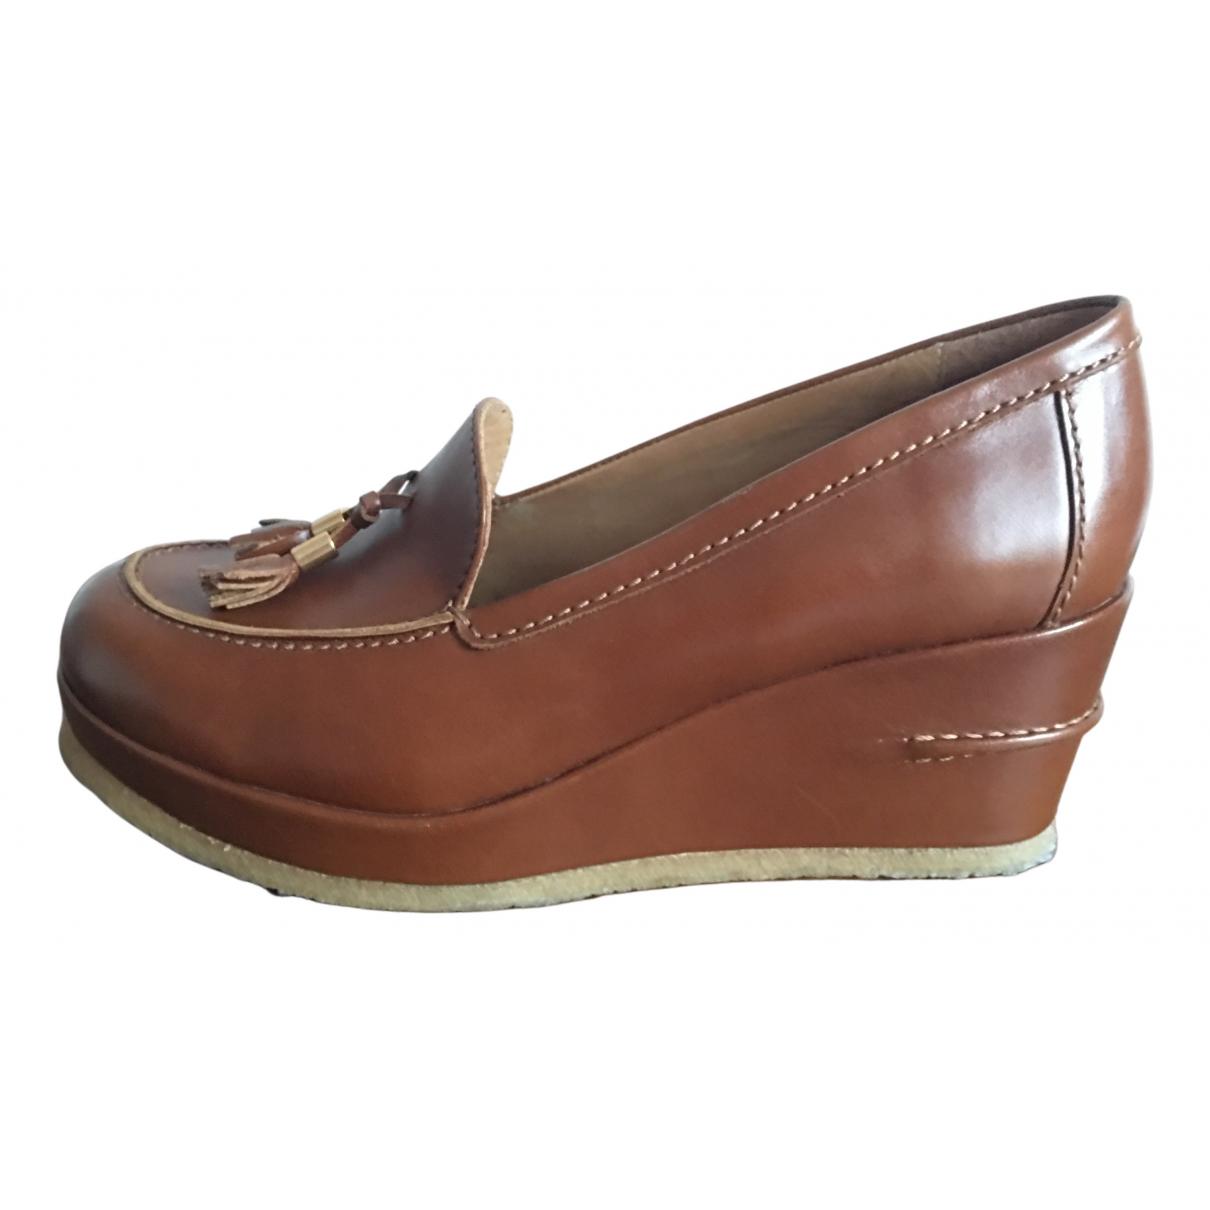 Apc N Camel Leather Flats for Women 41 EU